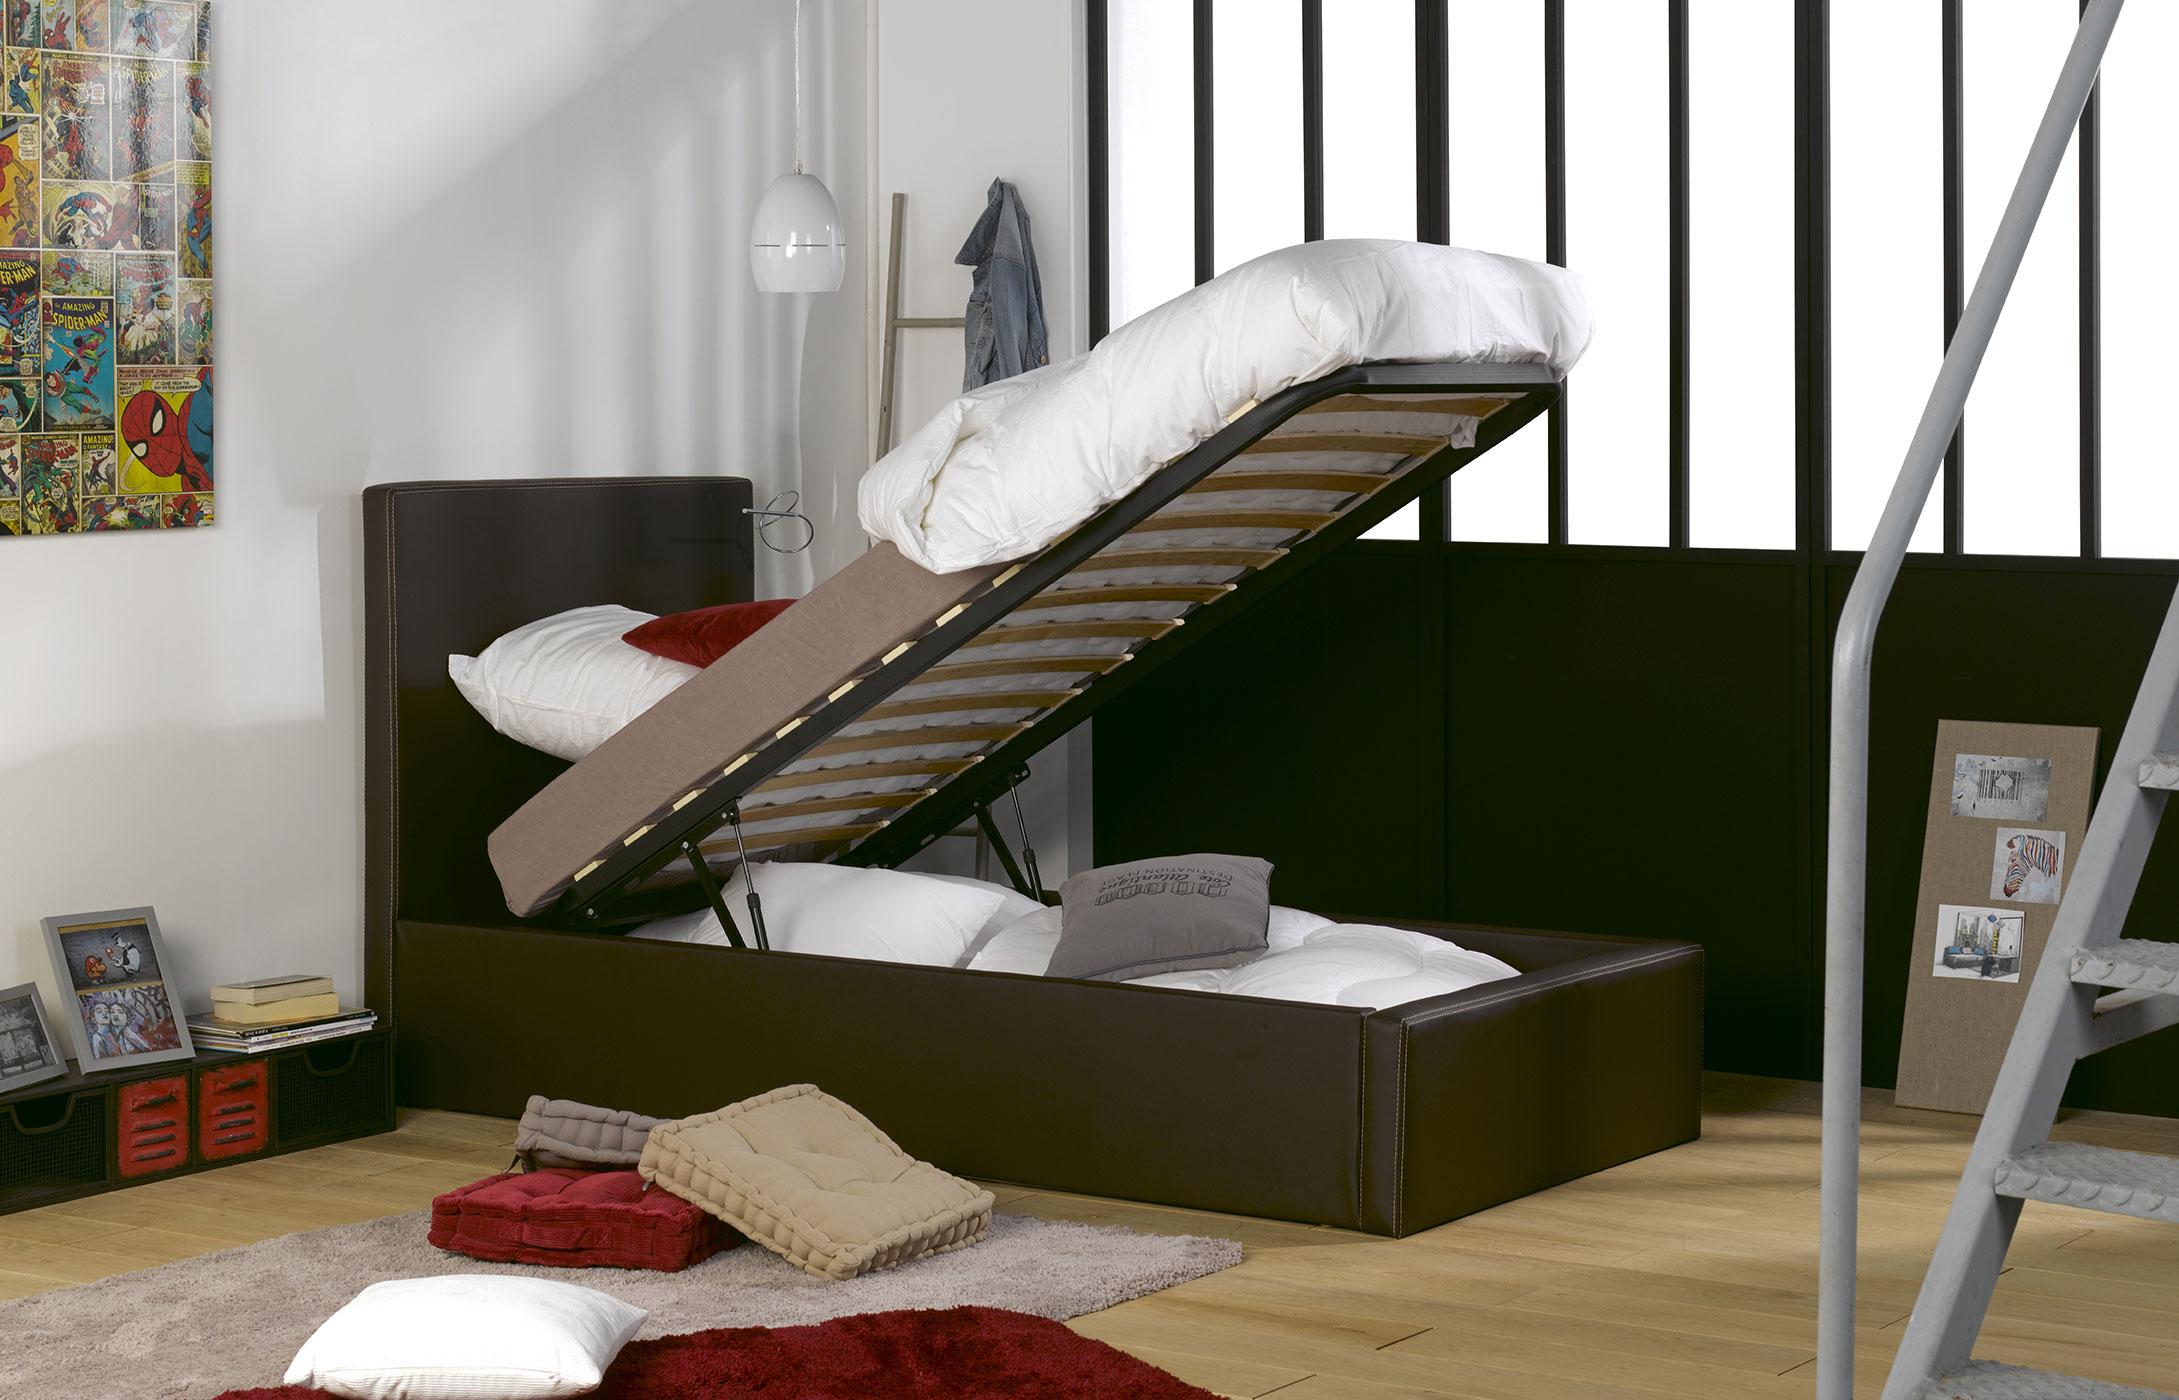 lit coffre enfant orlando similicuir marron idkid 39 s. Black Bedroom Furniture Sets. Home Design Ideas